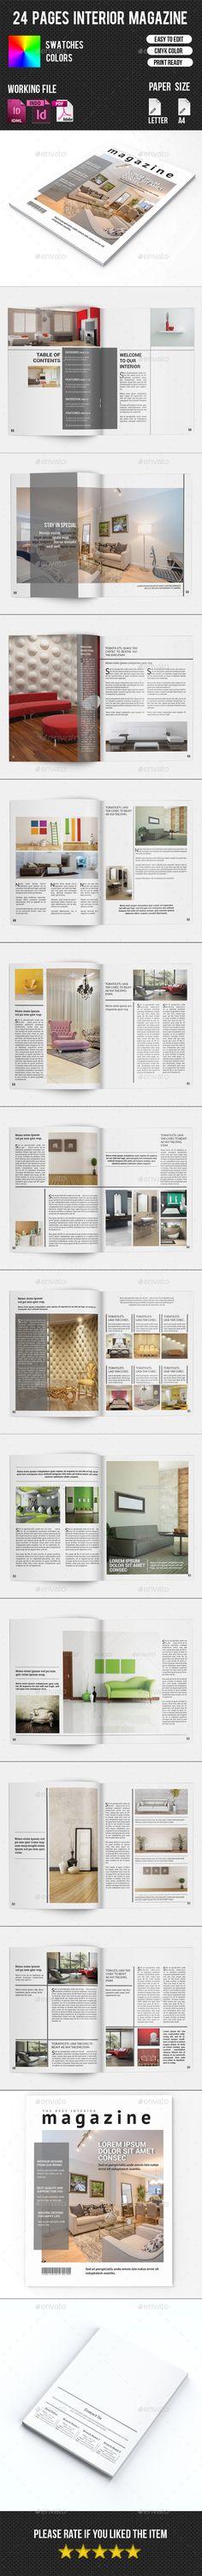 Interior Magazine Template #design #journal Download: http://graphicriver.net/item/interior-magazine-templatev07/10797082?ref=ksioks